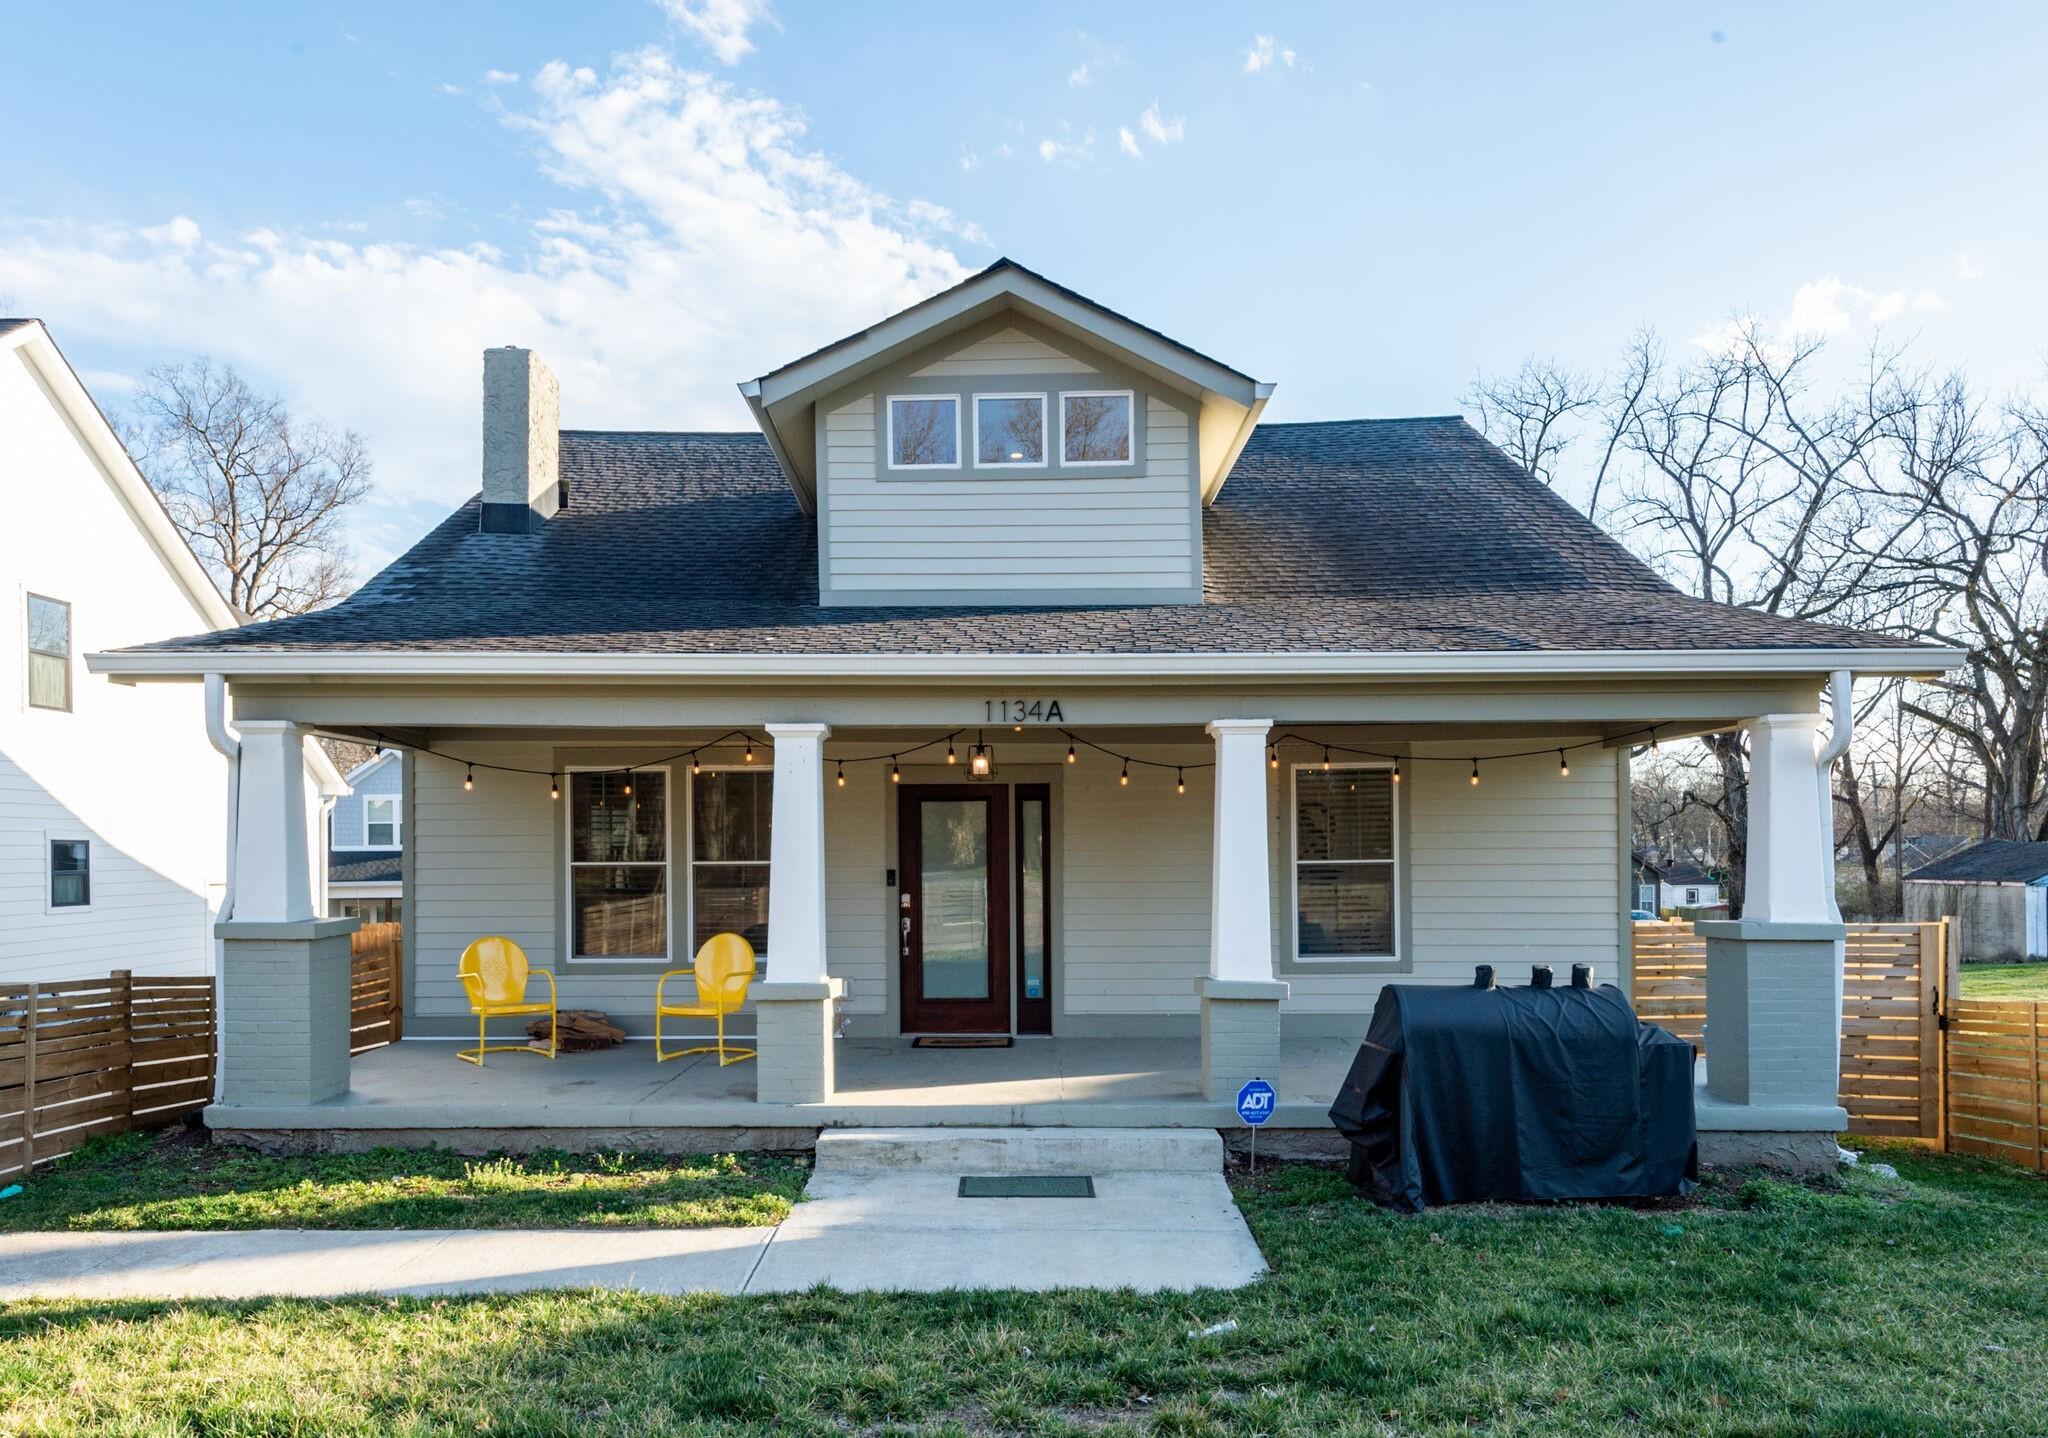 1134A Cahal Ave Property Photo - Nashville, TN real estate listing